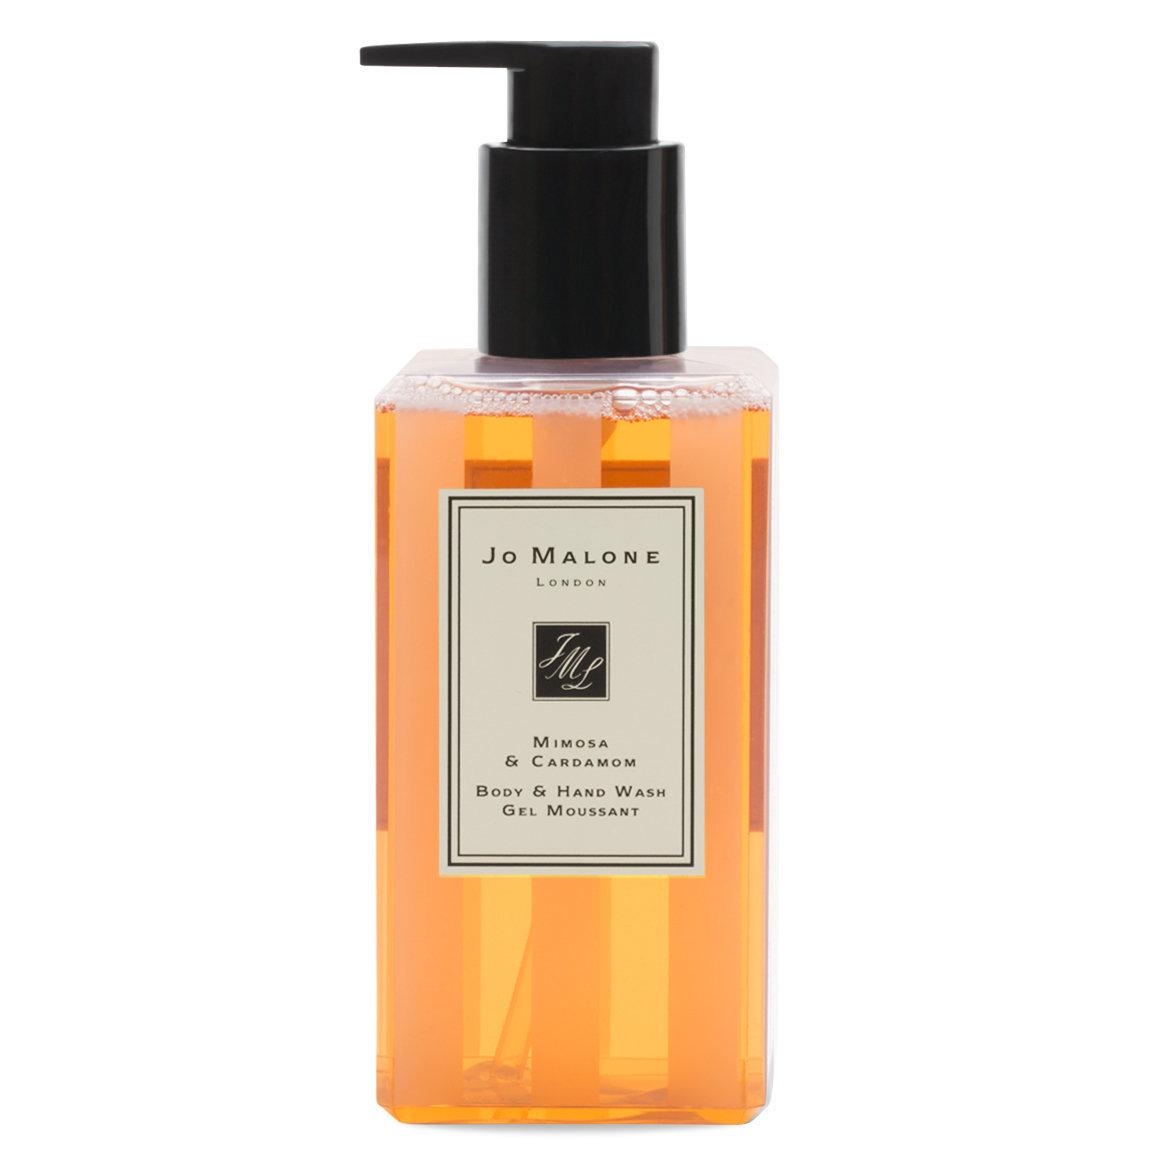 Jo Malone London Mimosa & Cardamom Body & Hand Wash alternative view 1 - product swatch.